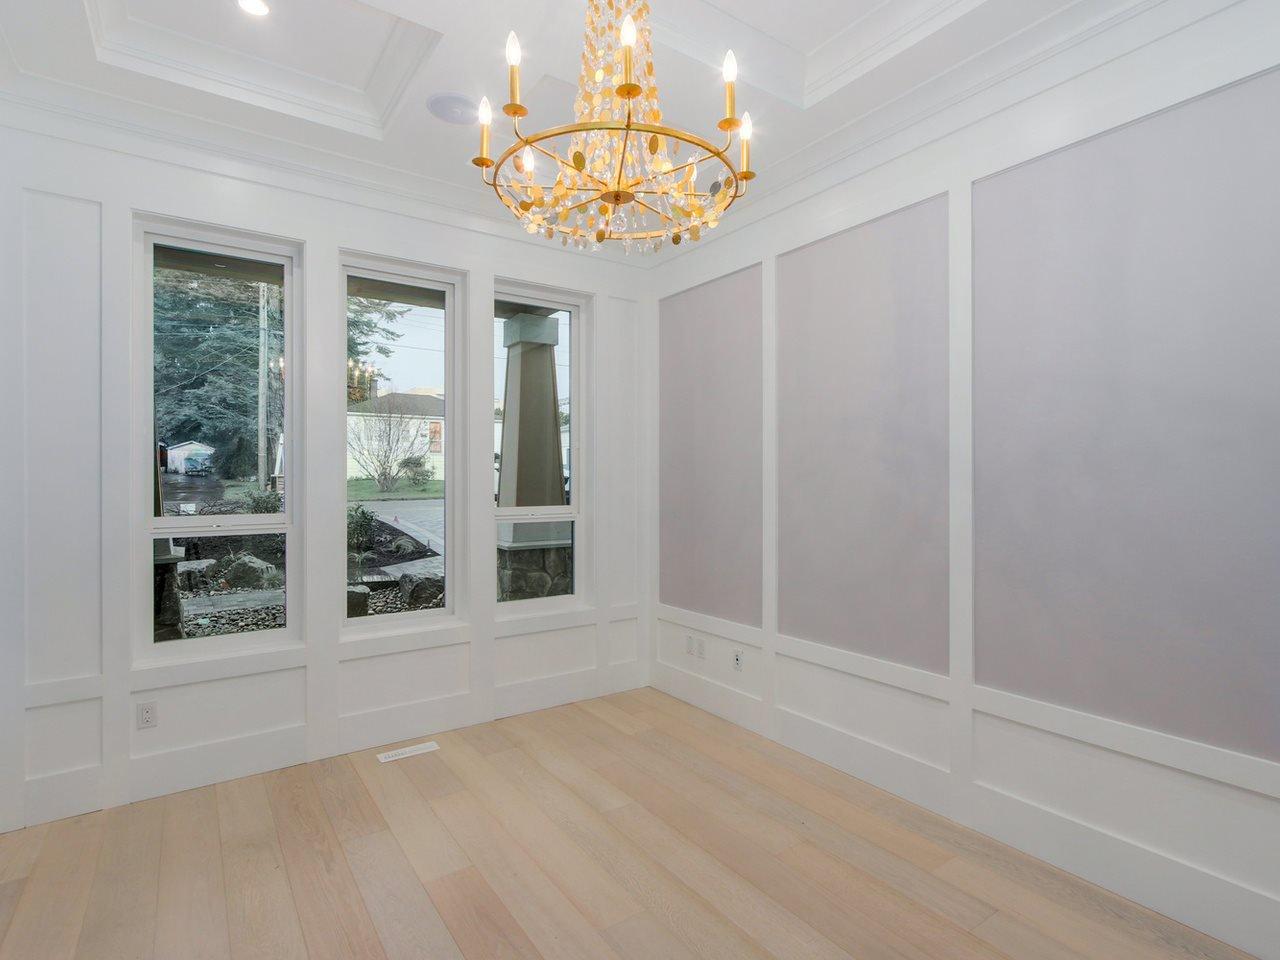 Photo 4: Photos: 1560 MAPLE Street: White Rock House for sale (South Surrey White Rock)  : MLS®# R2138926